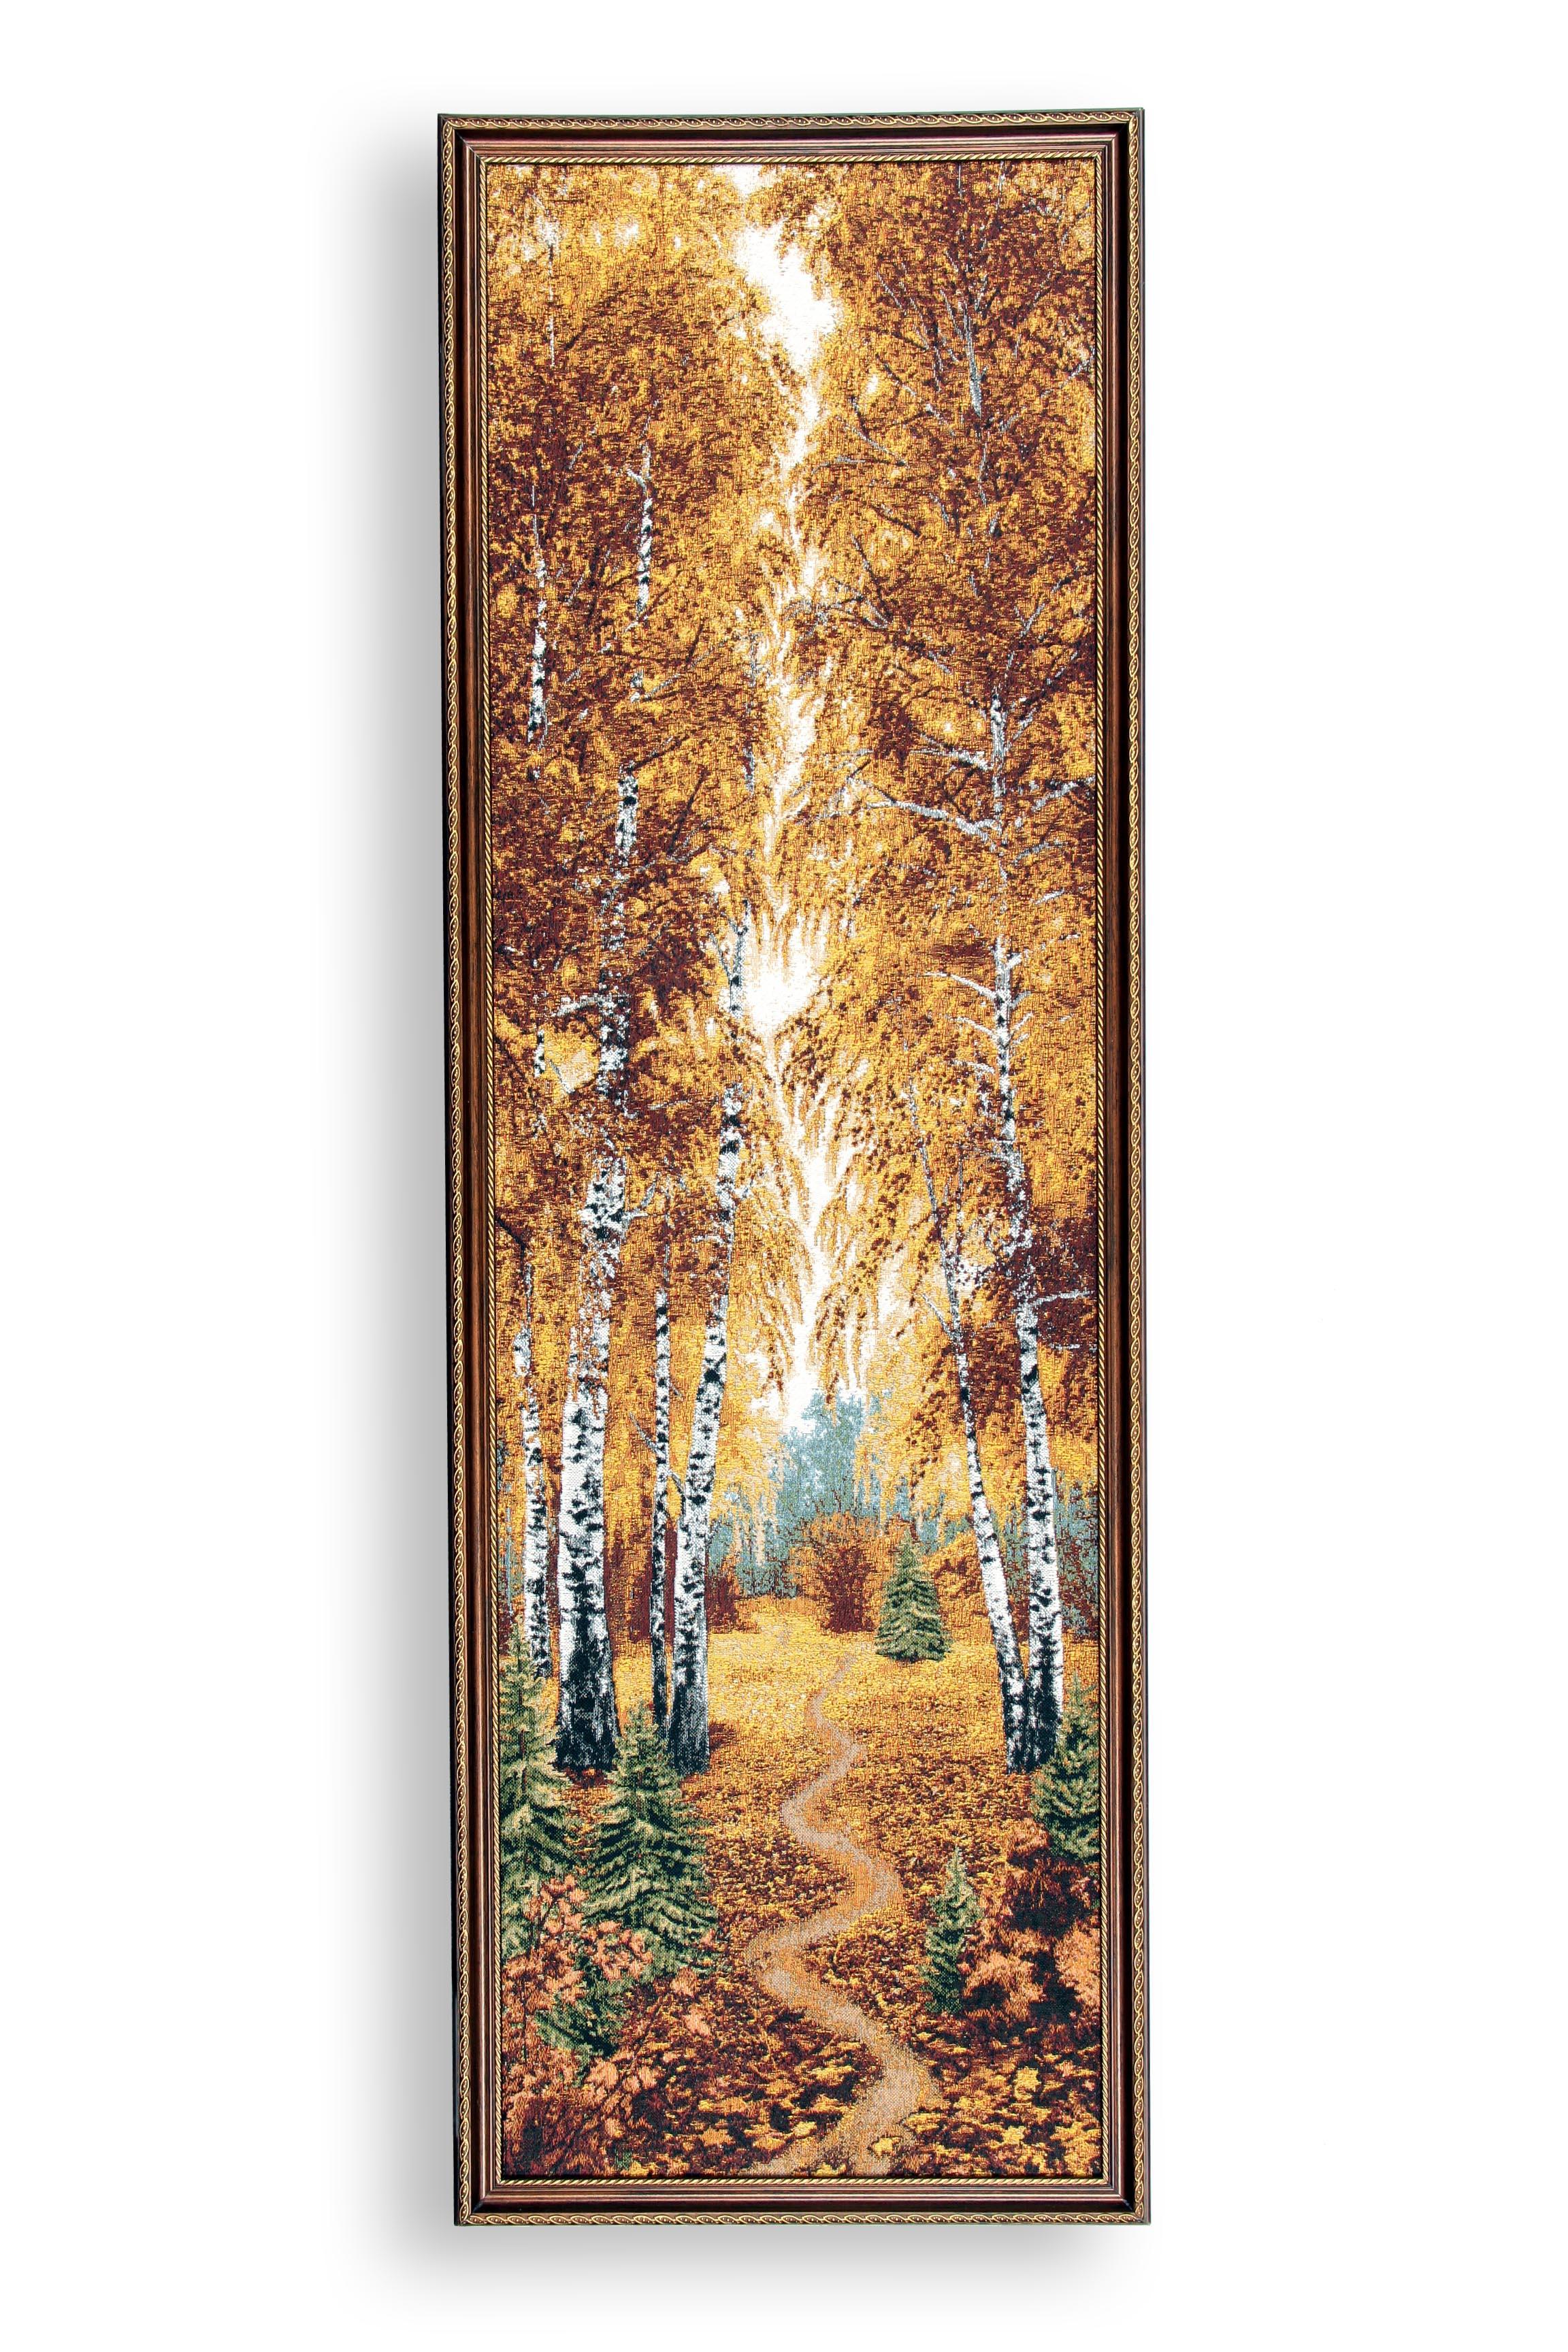 Картина Магазин гобеленов осенний лес 40*115см, Гобелен цена и фото